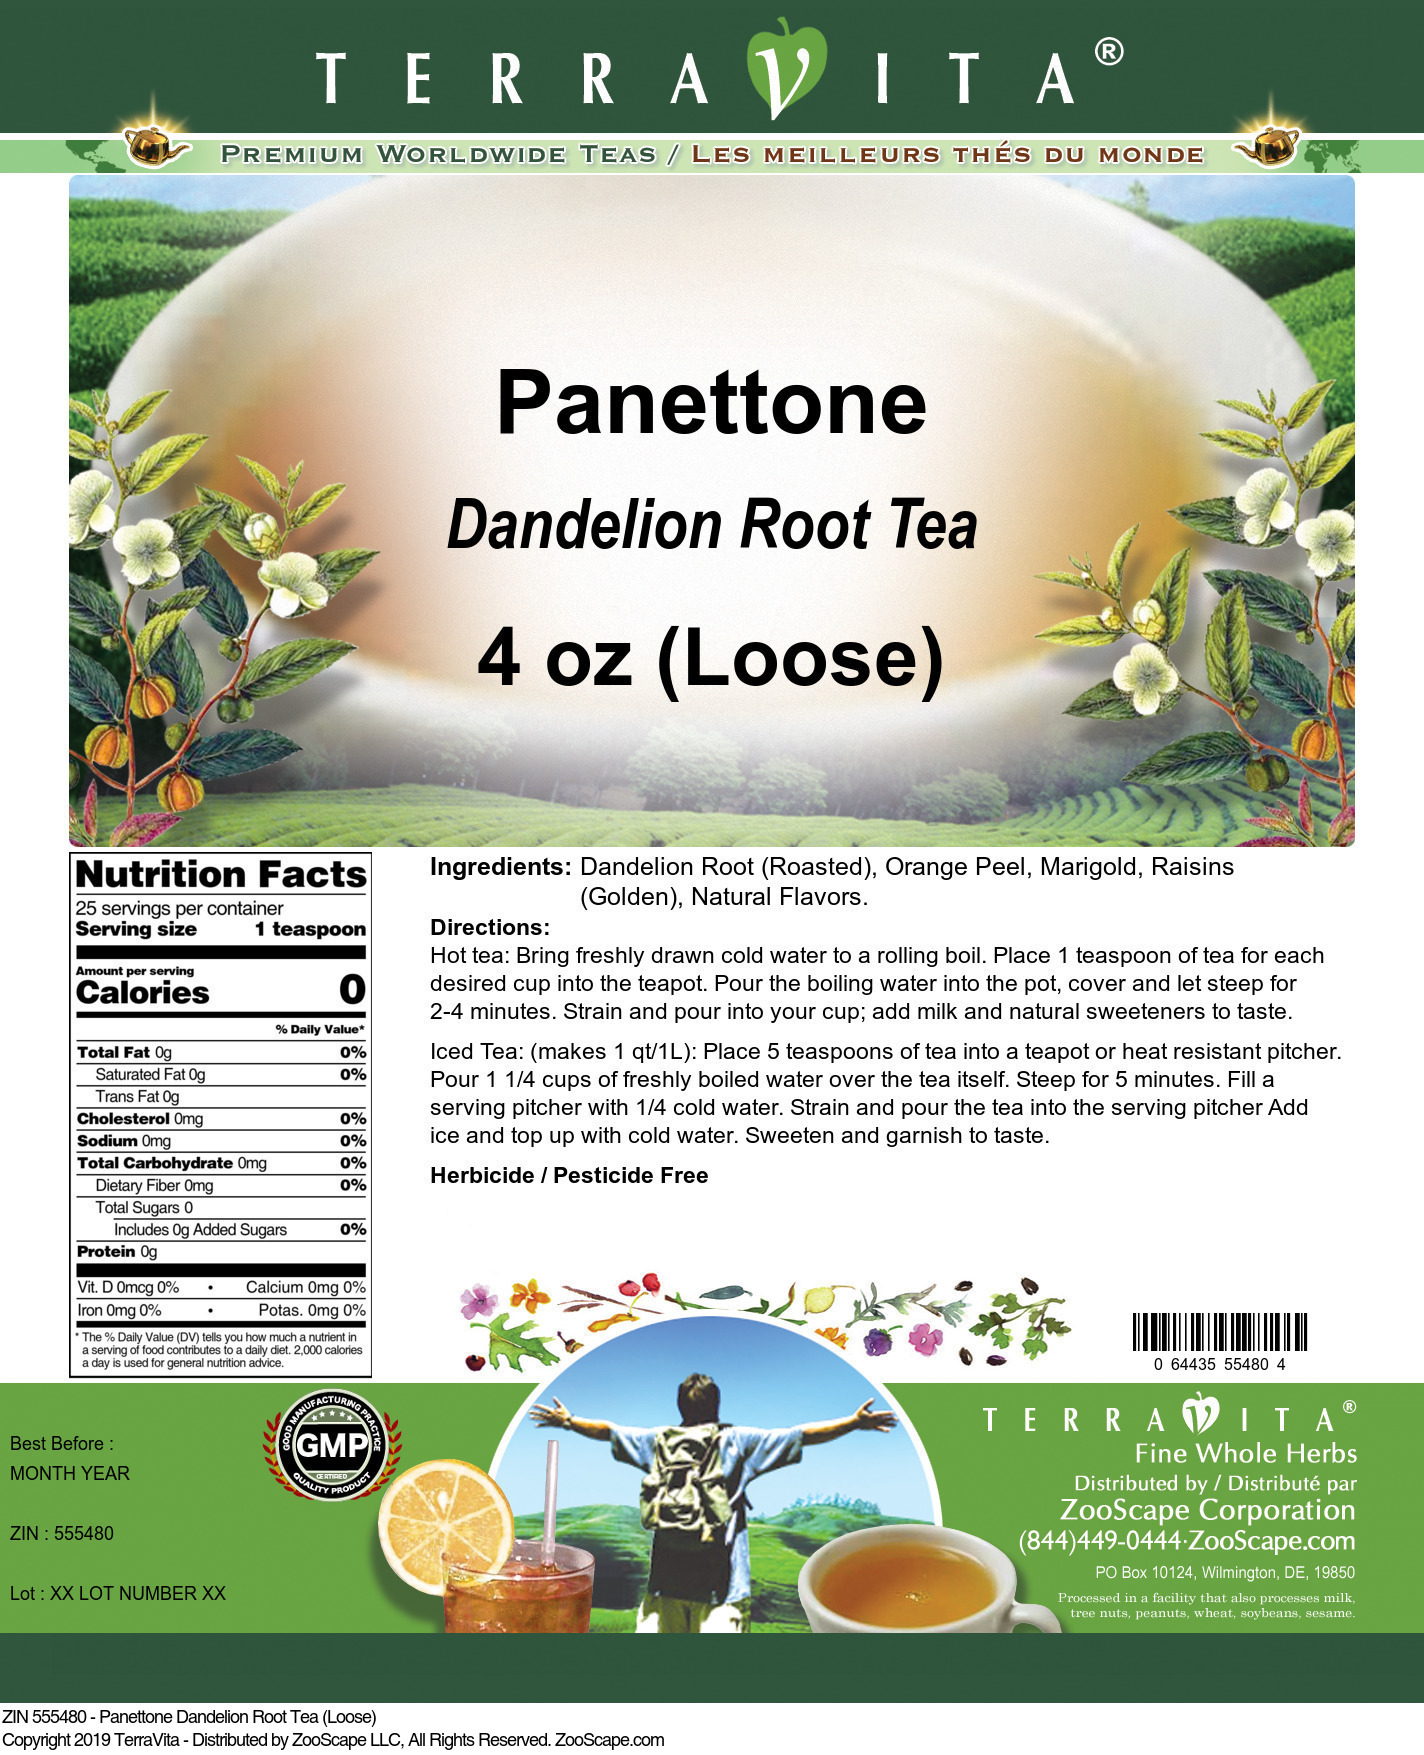 Panettone Dandelion Root